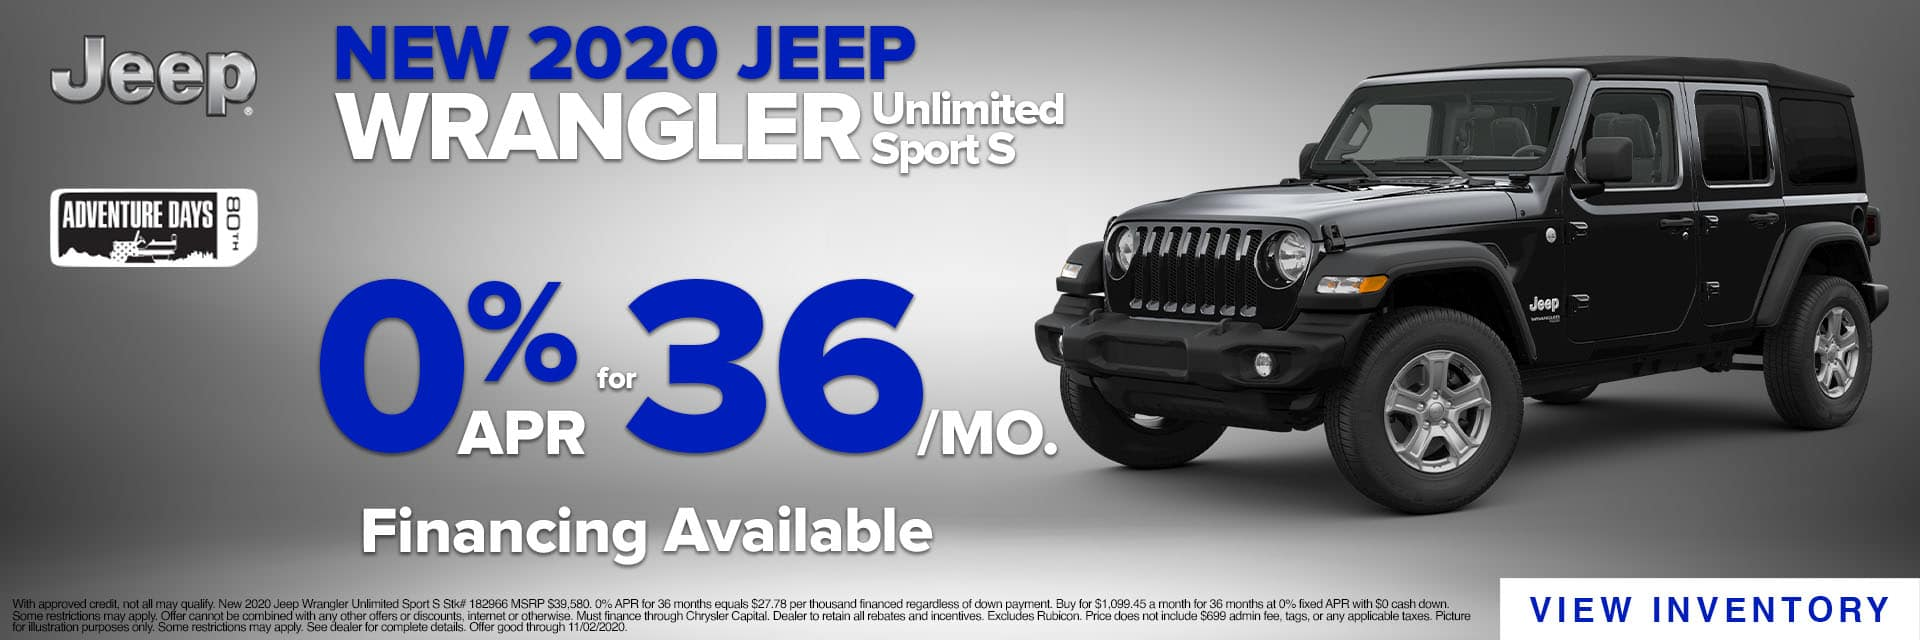 CLGO-October 2020-2020 Jeep Wrangler Inspire Slider